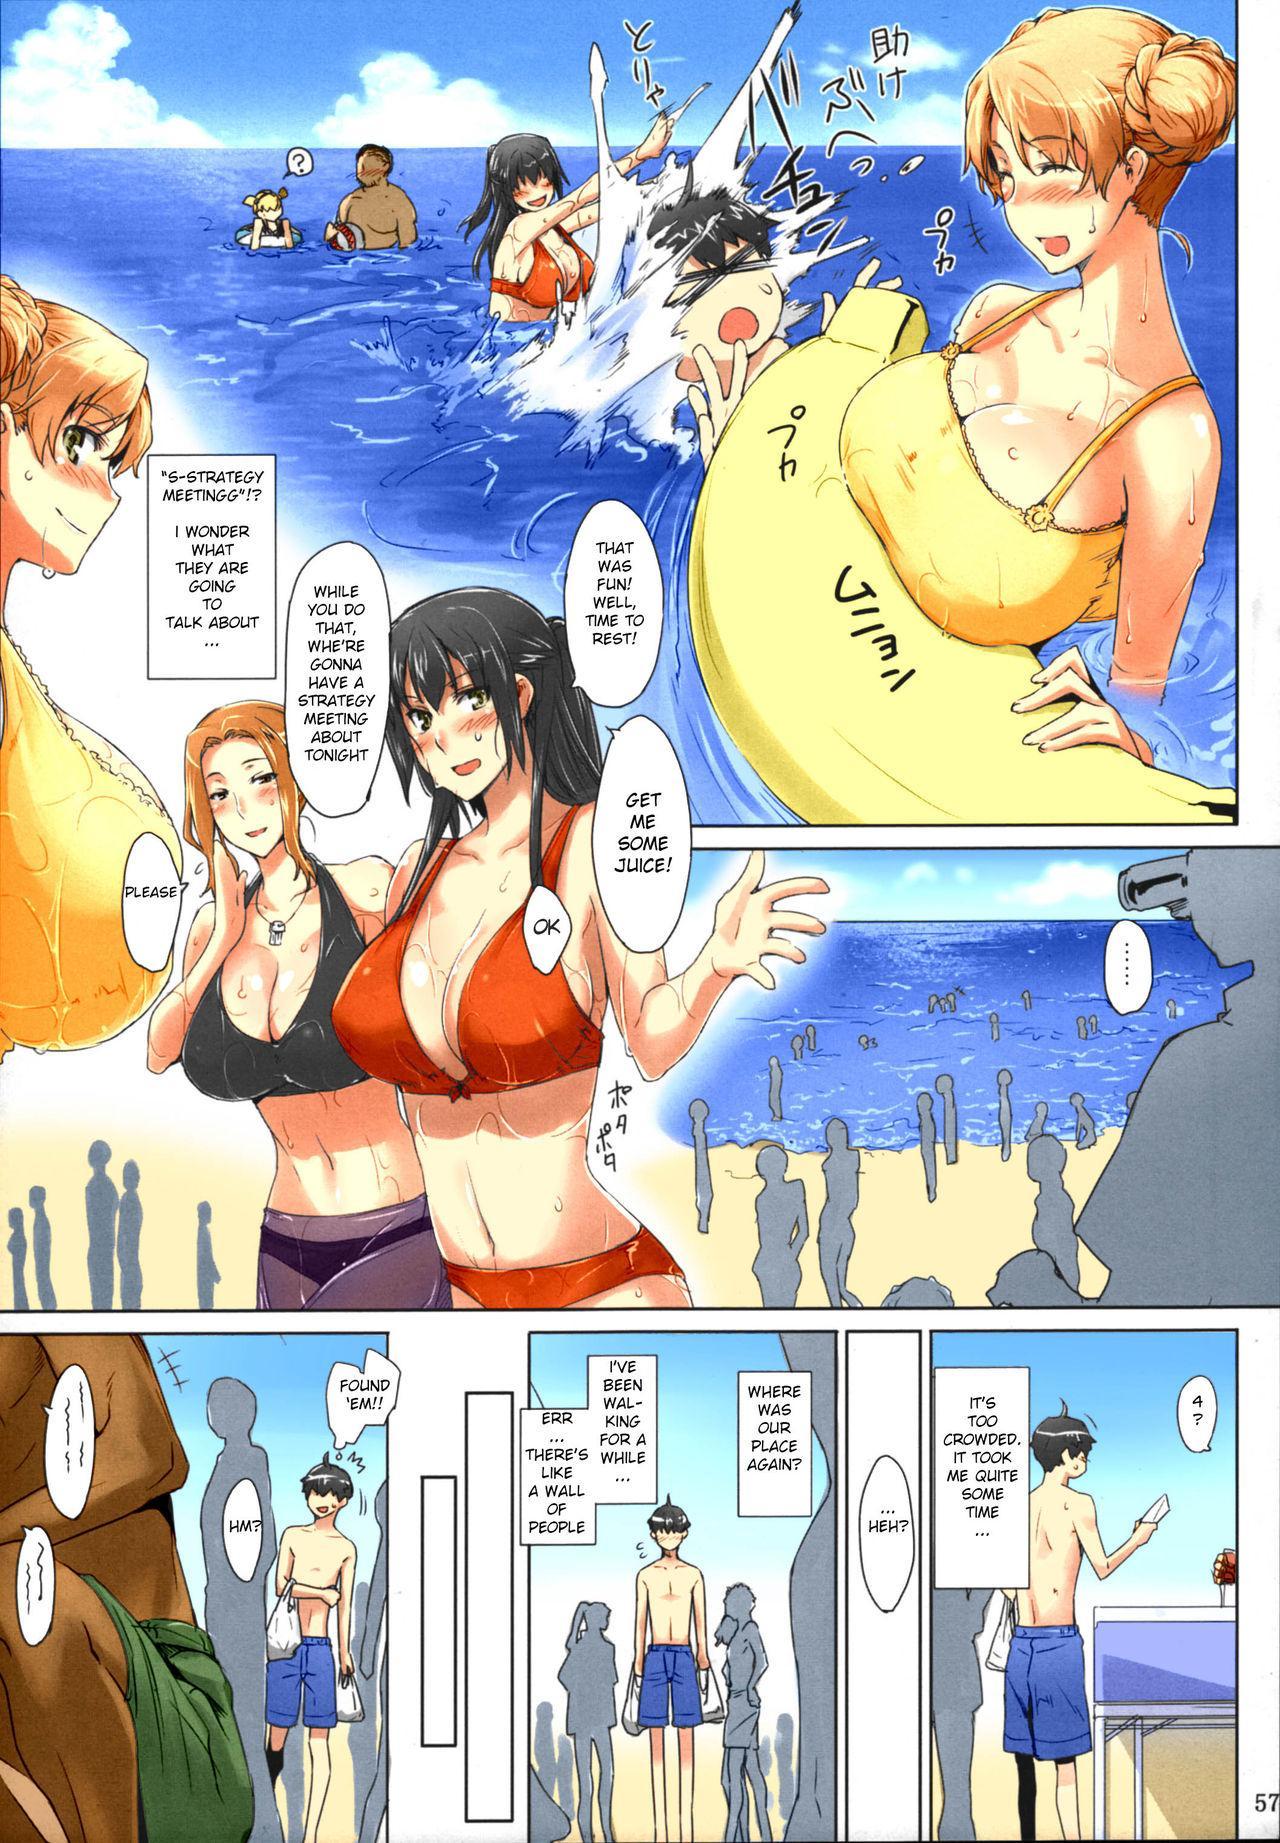 (C86) [MTSP (Jin)] Tachibana-san-chi no Dansei Jijou Matome Ban [English] [Colorized] 54